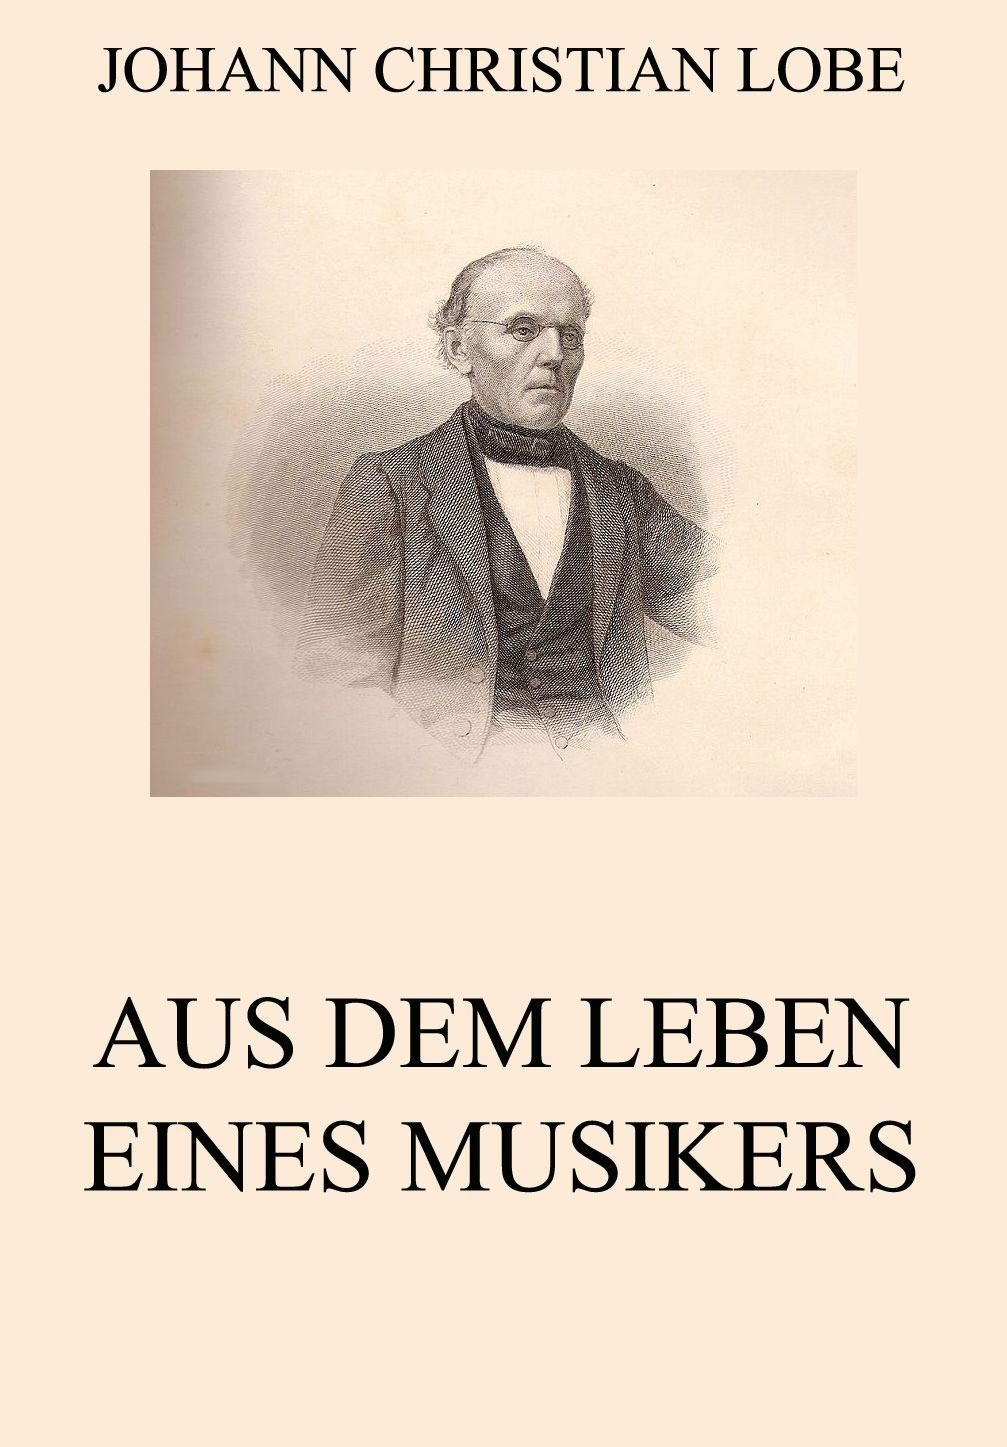 цена Johann Christian Lobe Aus dem Leben eines Musikers онлайн в 2017 году